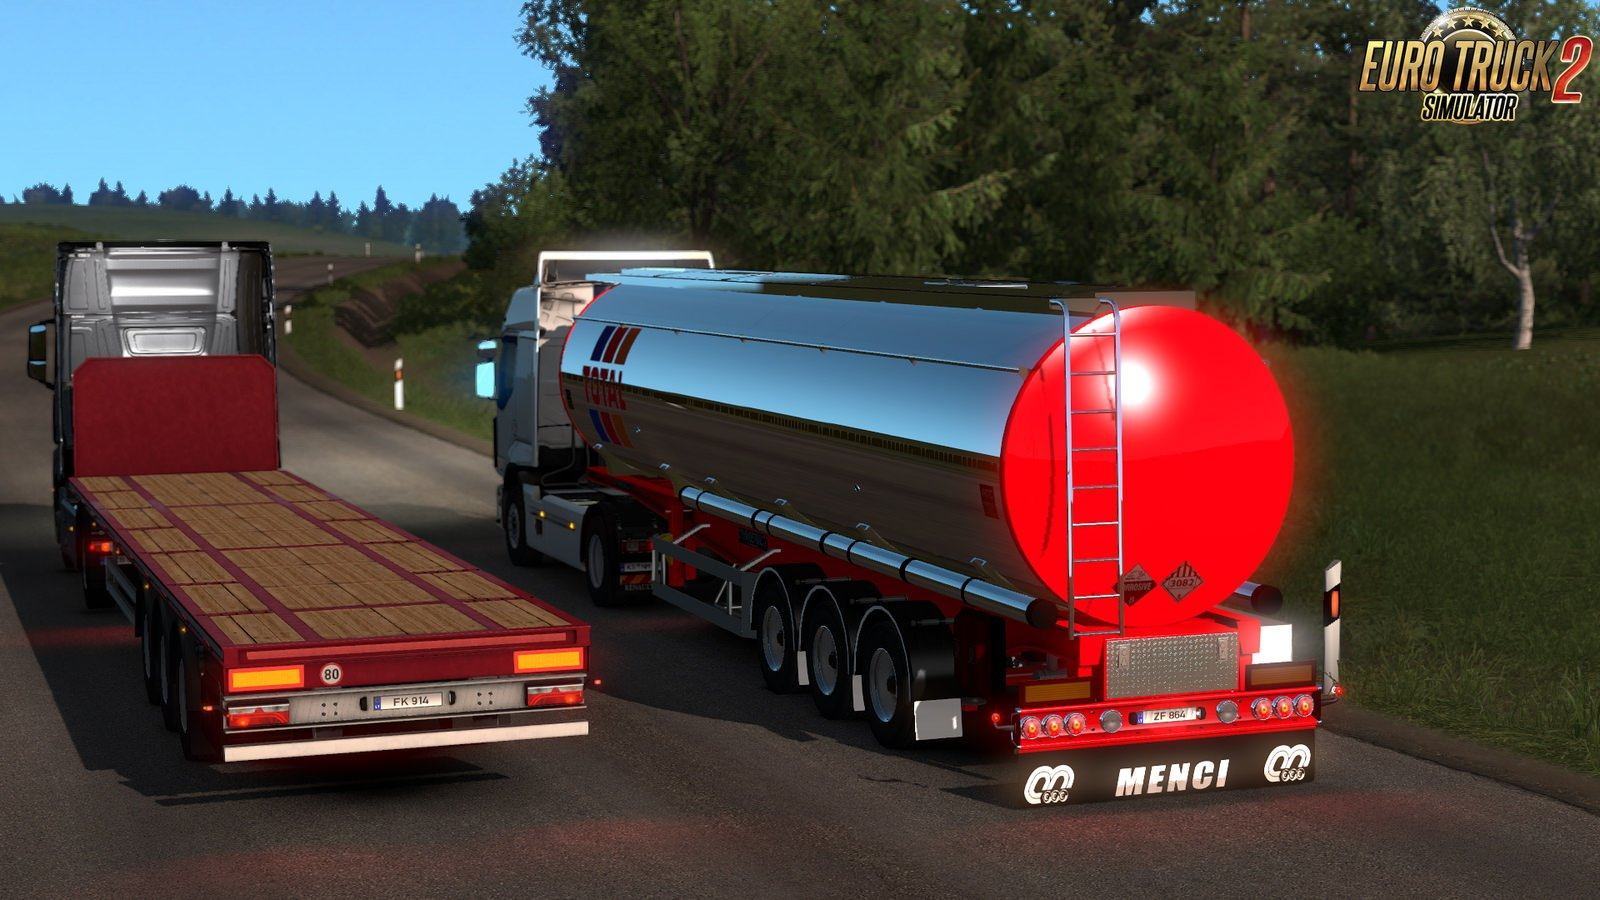 Cistern Menci v1.35 by MDModding